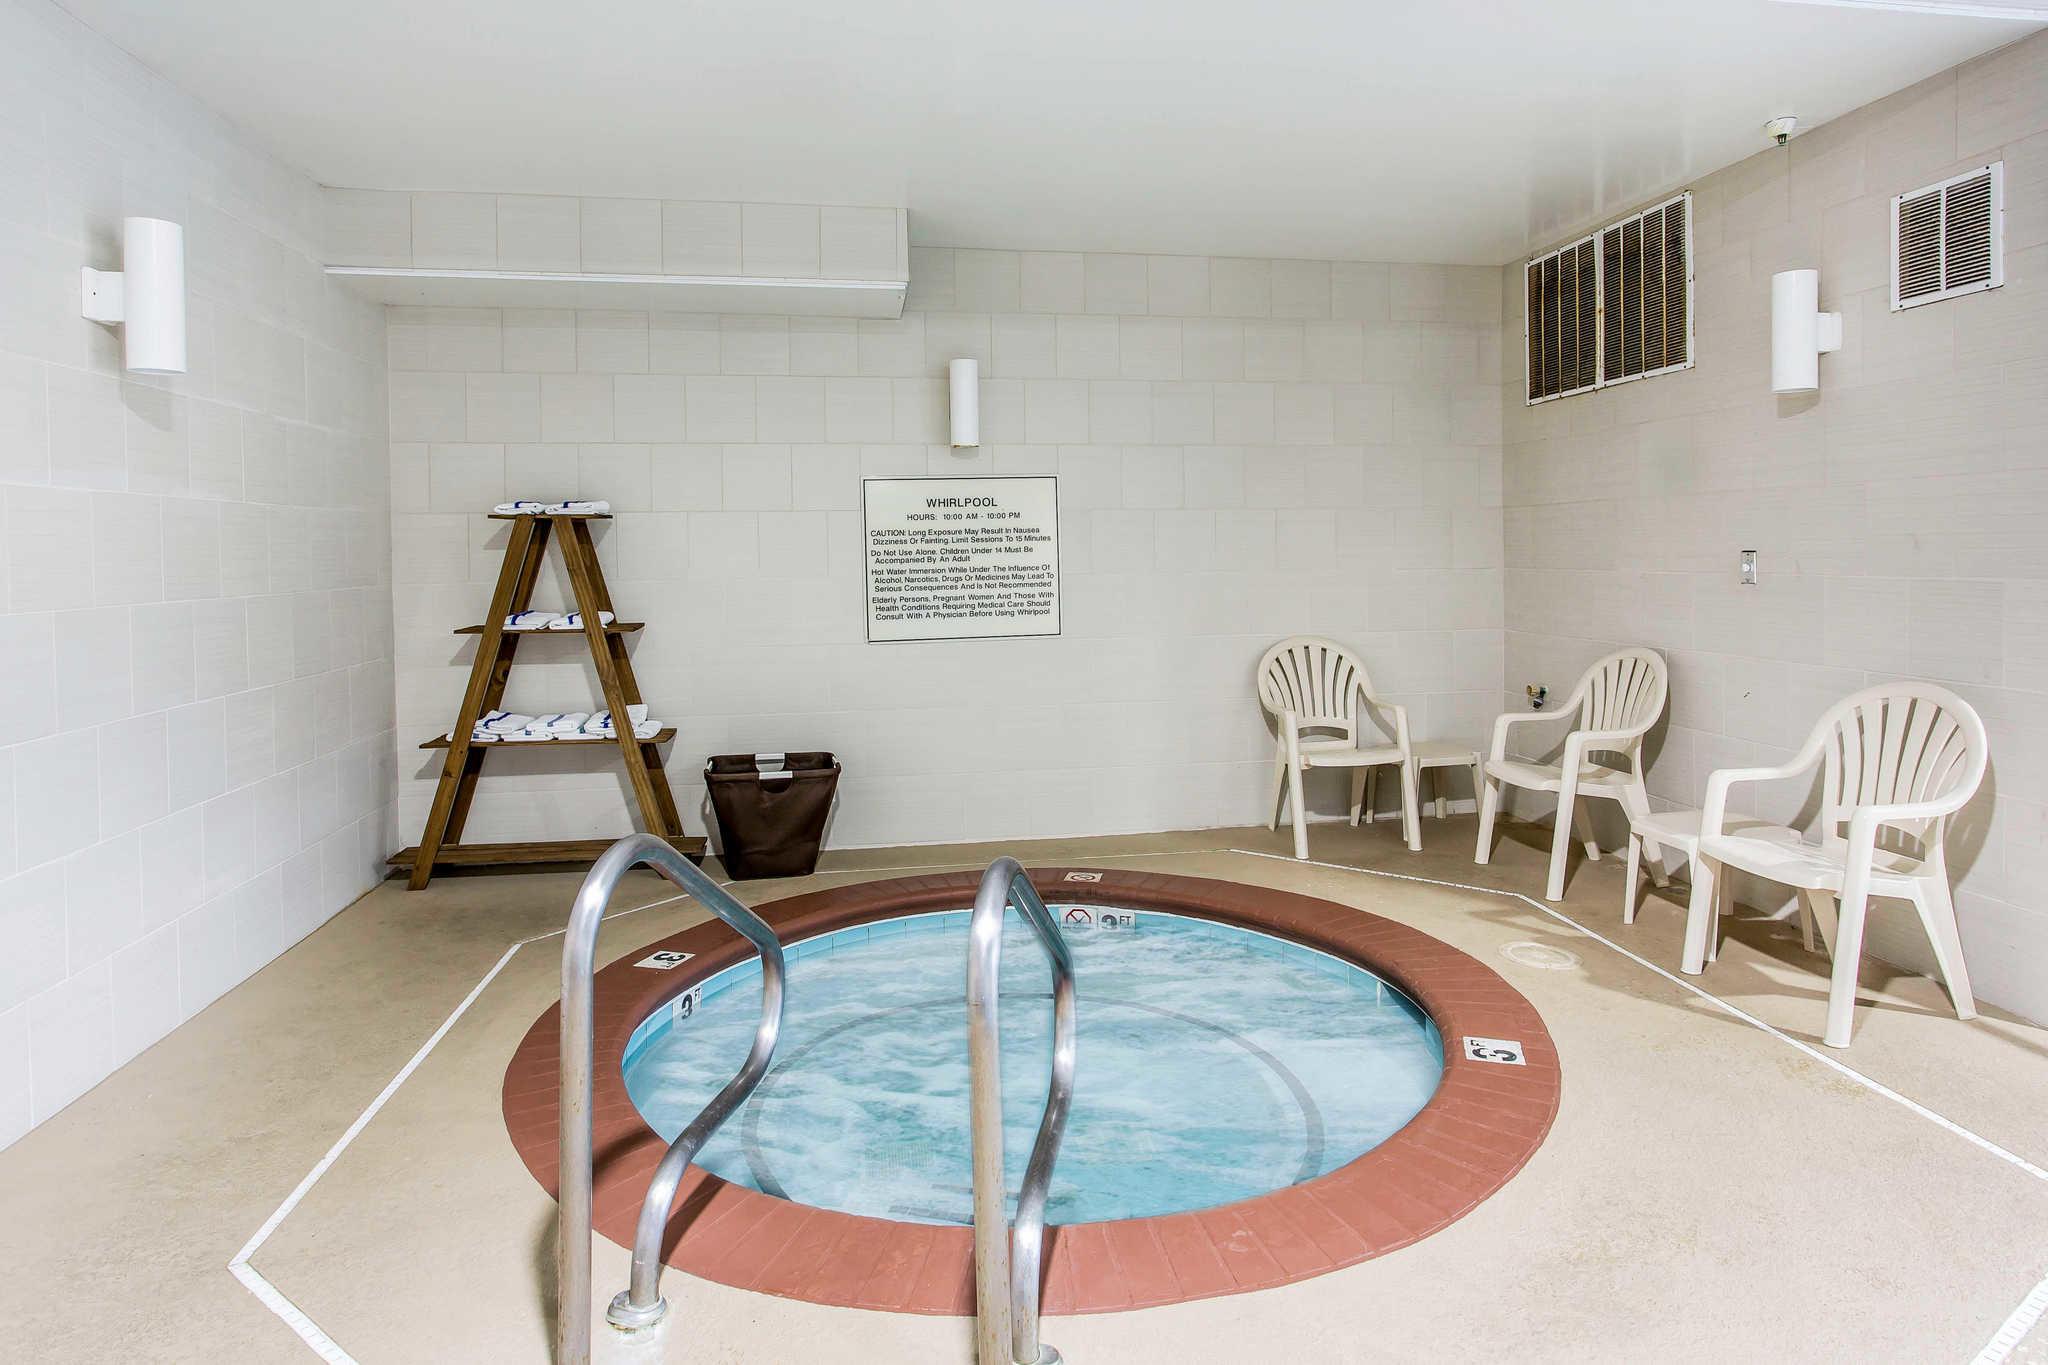 Comfort Inn & Suites image 25